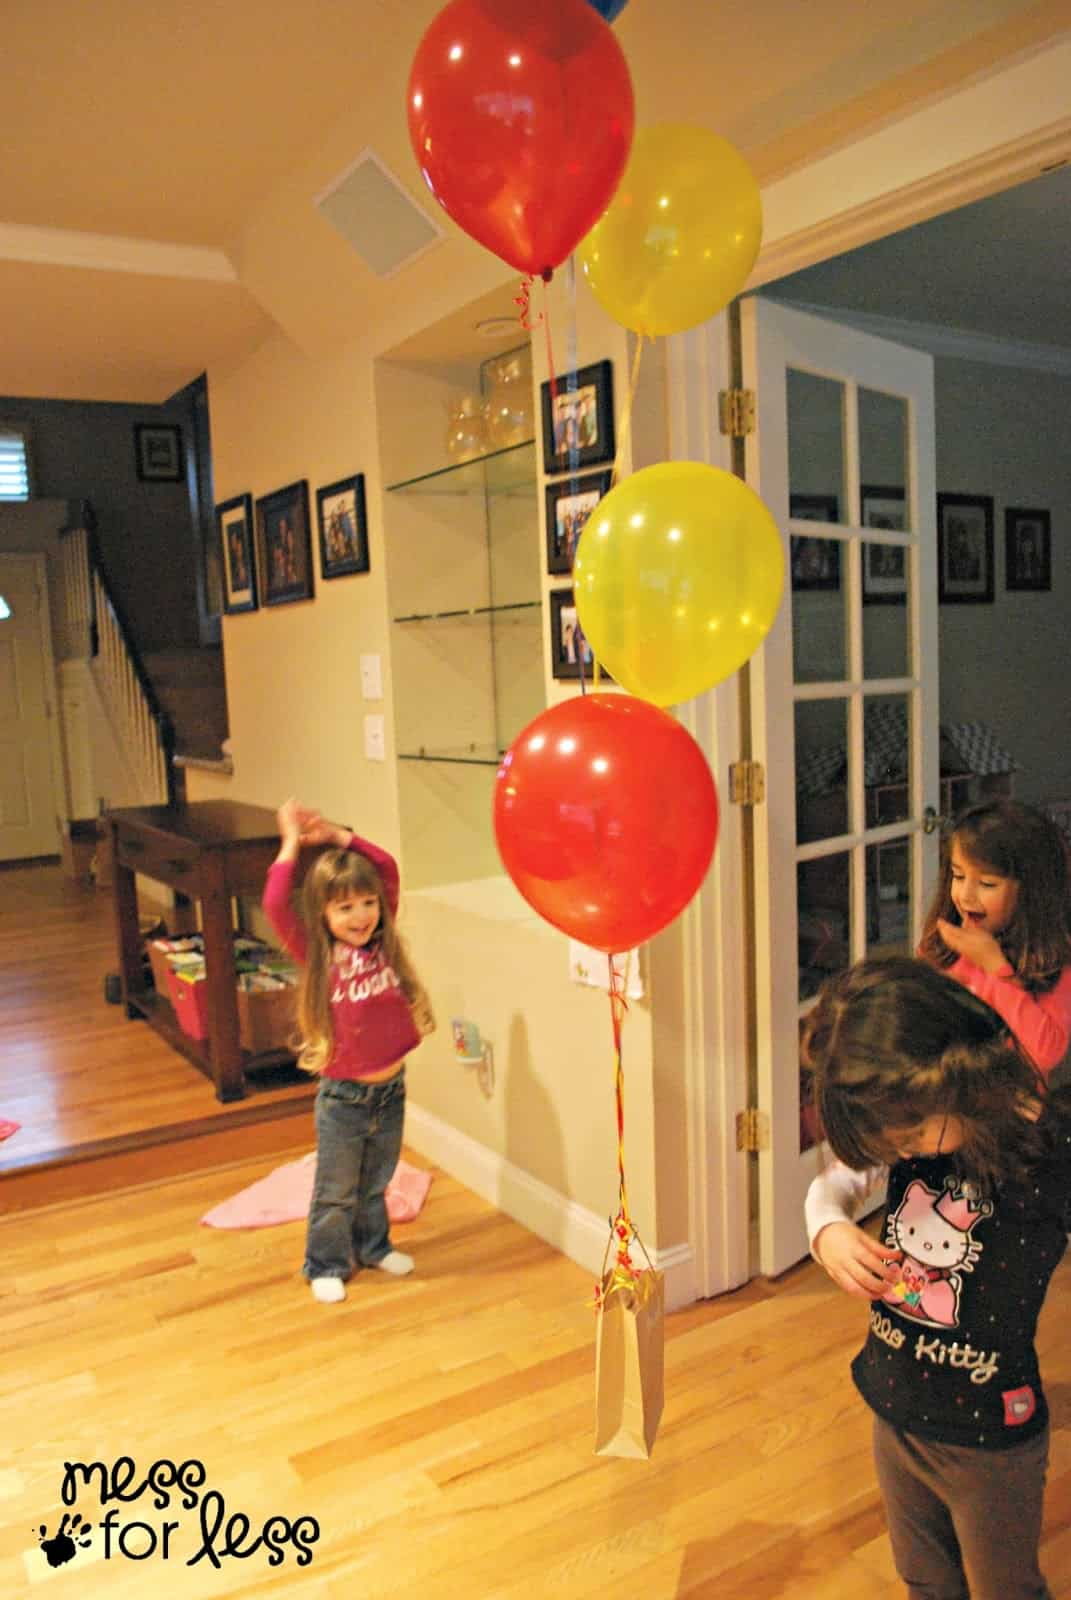 Balloons lifting a bag